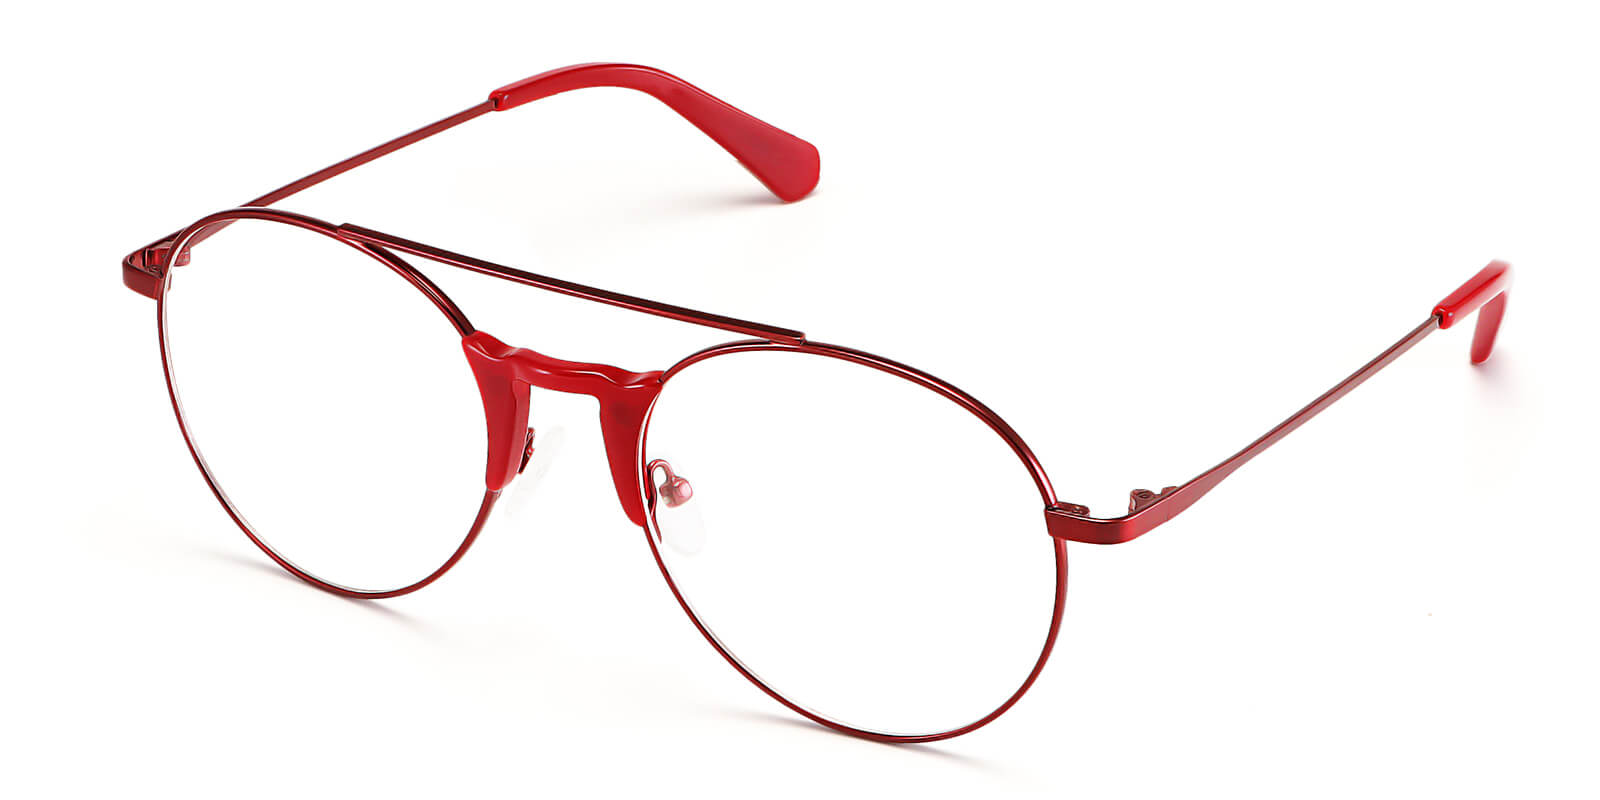 Astronomer-Aviator glasses : trendy hollow double bridge design